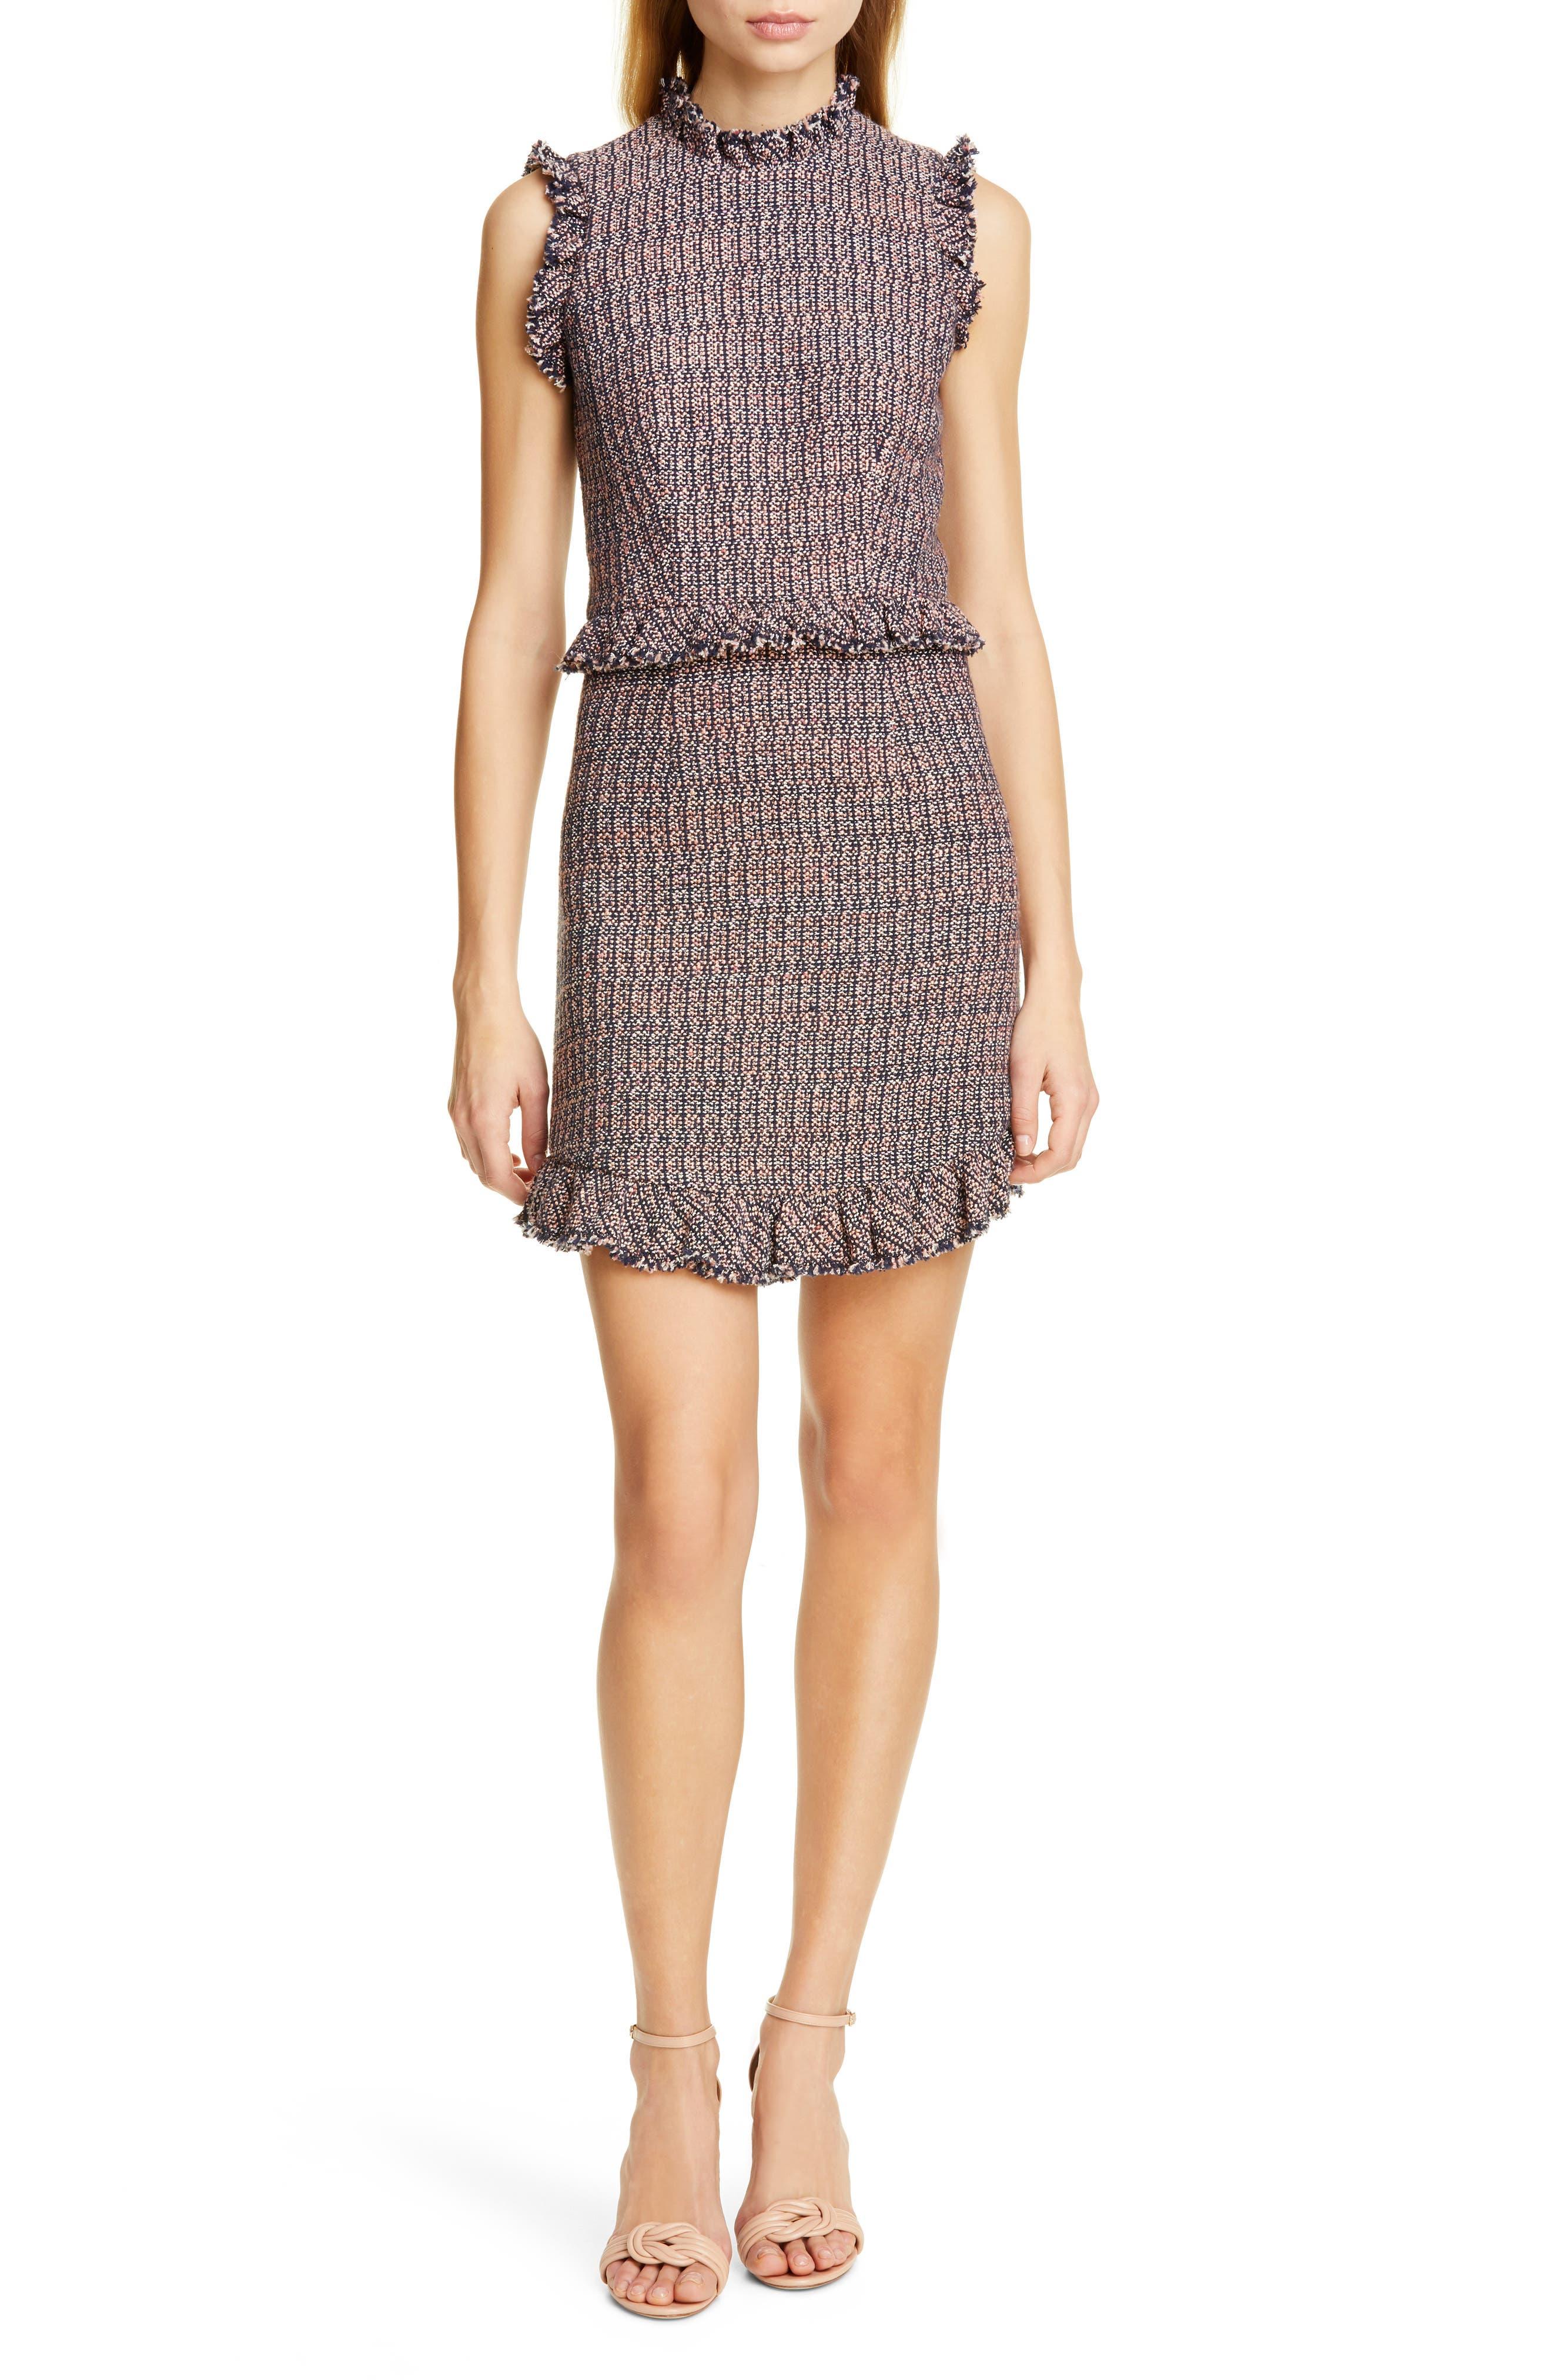 REBECCA TAYLOR Frayed Ruffle Tweed Dress, Main, color, PINK/ NAVY COMBO